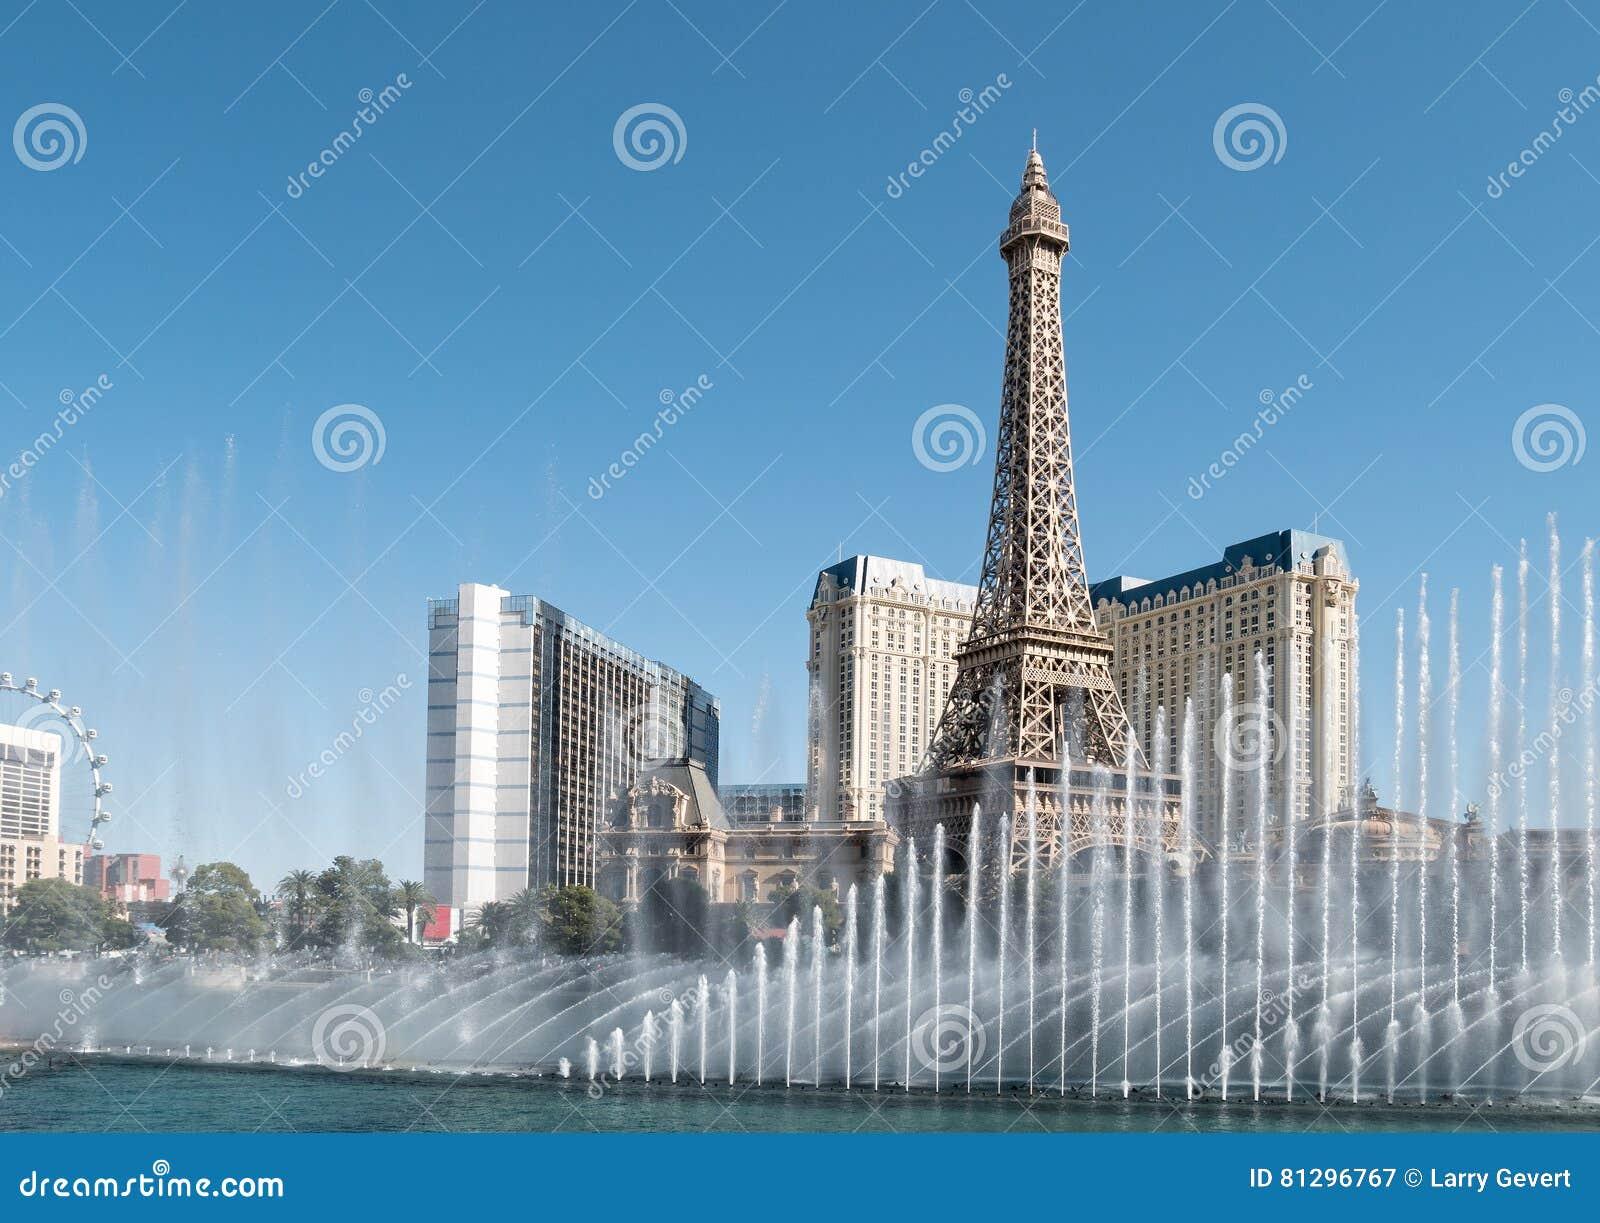 Tour Eiffel, fontaines de Bellagio